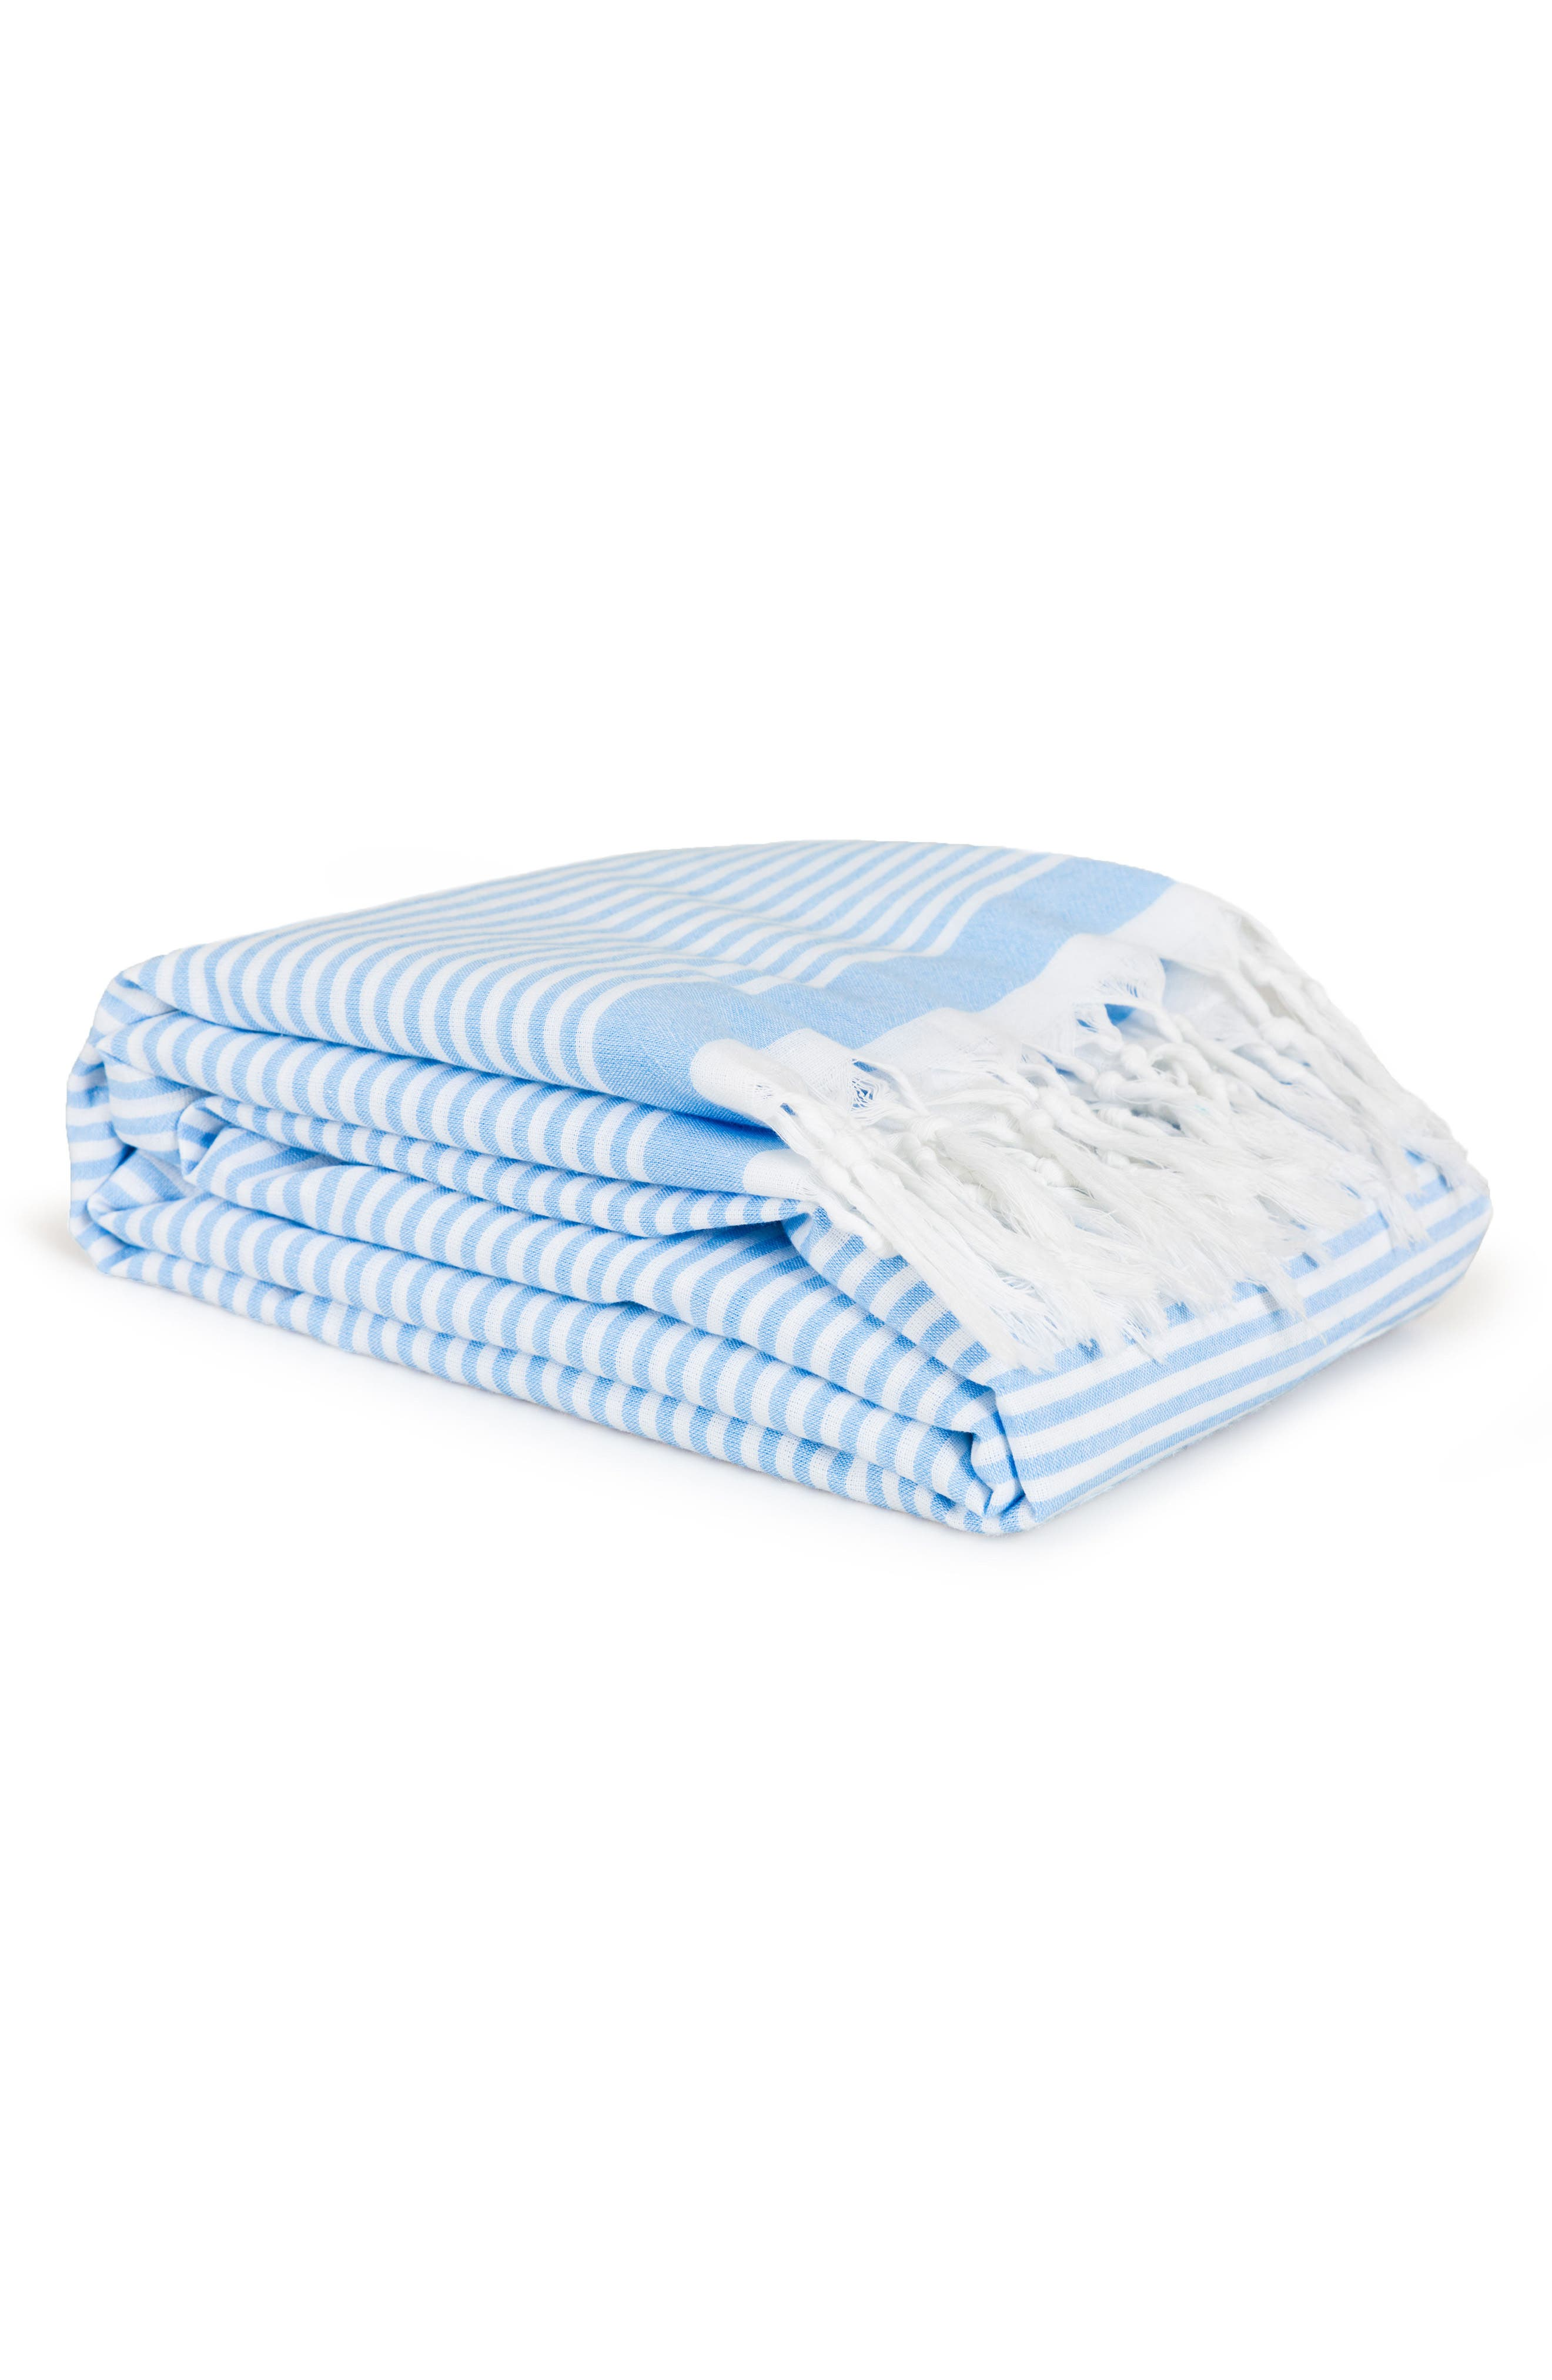 Soft Stripes Turkish Pestemal Towel,                             Alternate thumbnail 4, color,                             Sky Blue